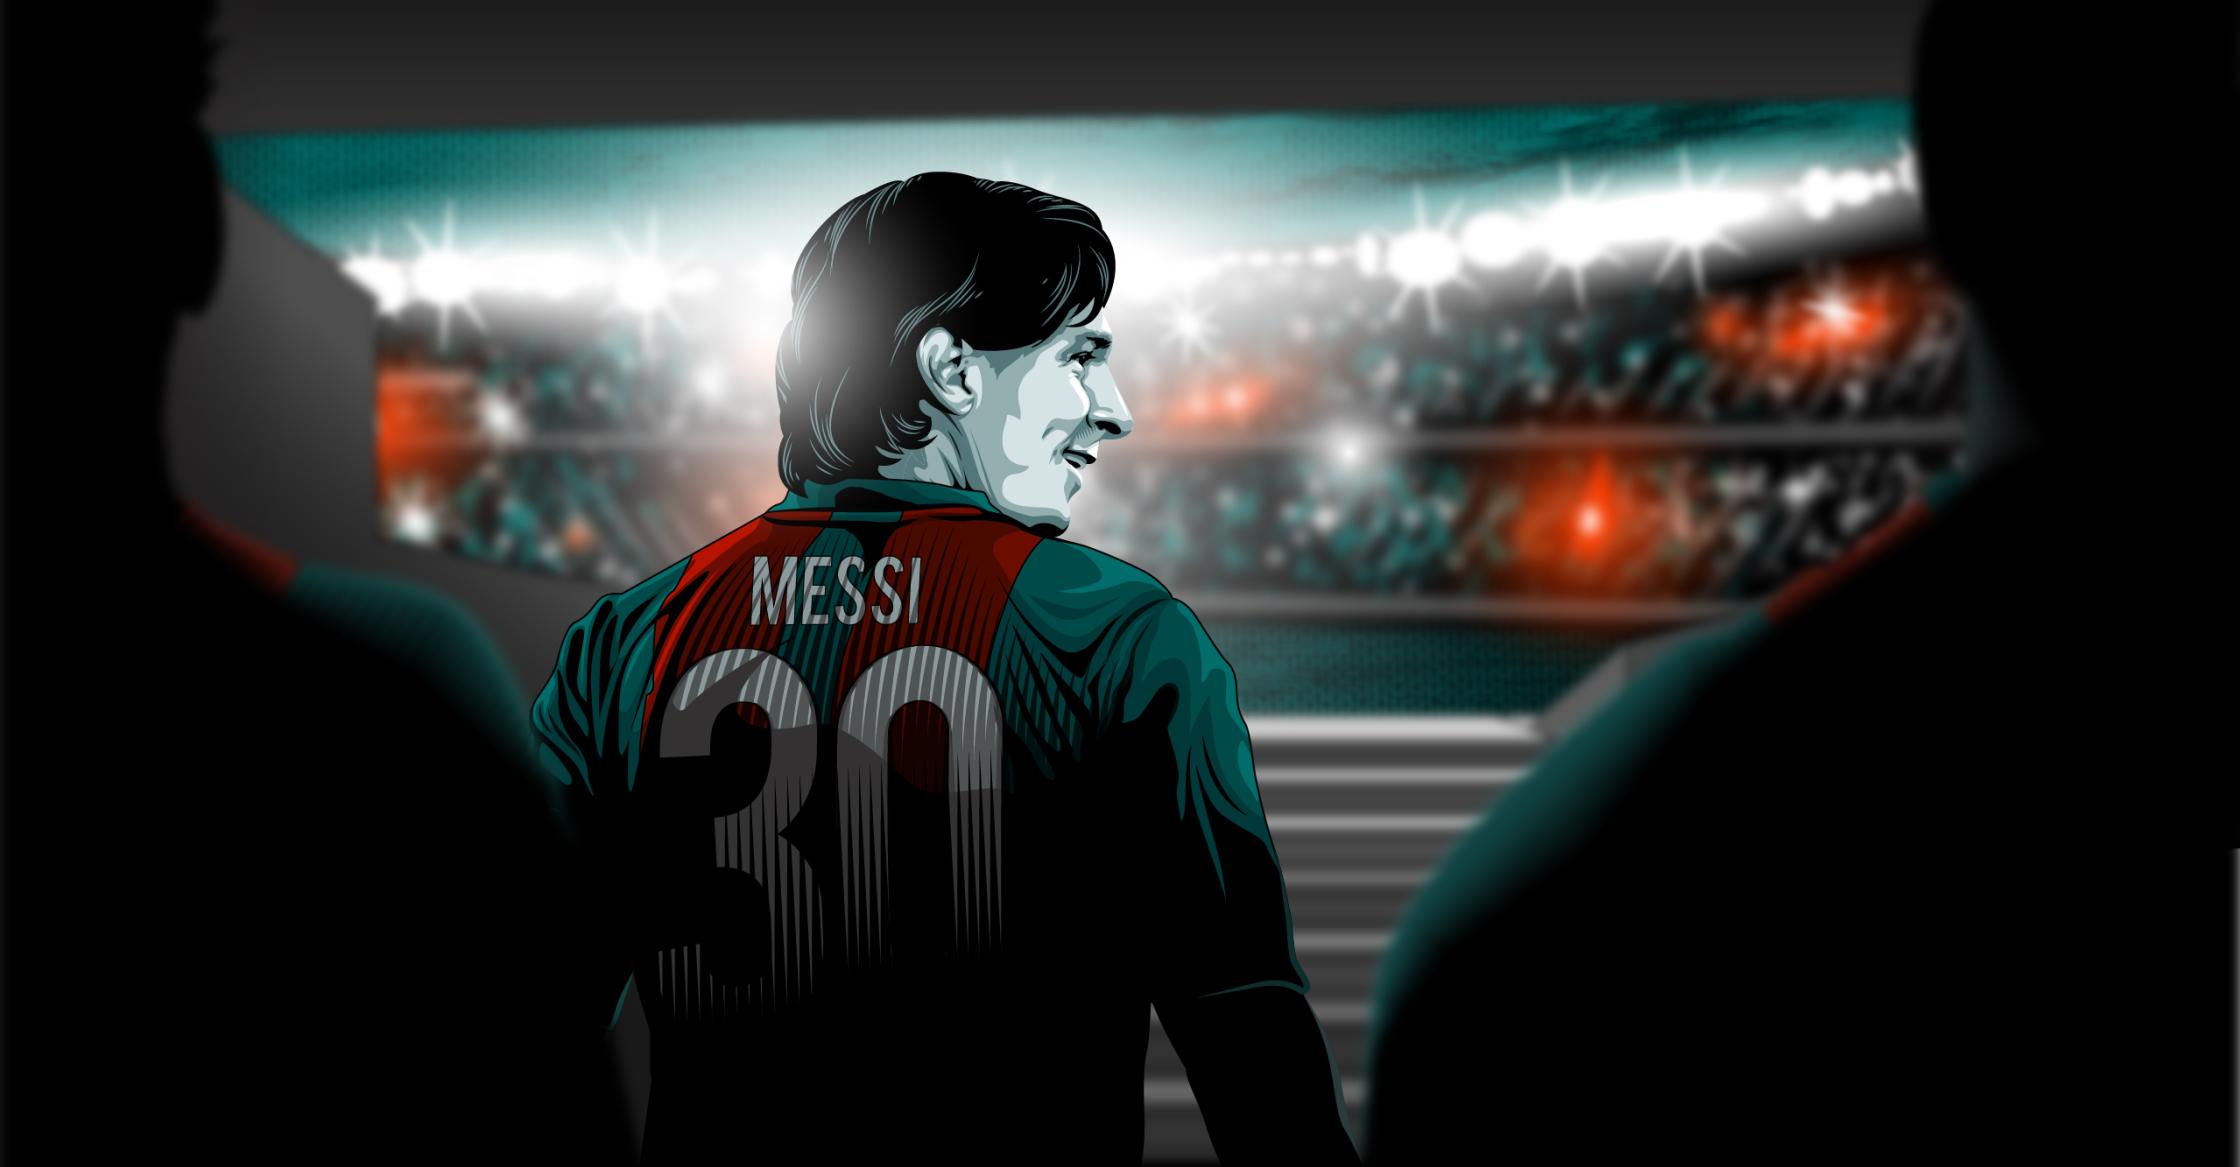 Messi 30 / Adidas